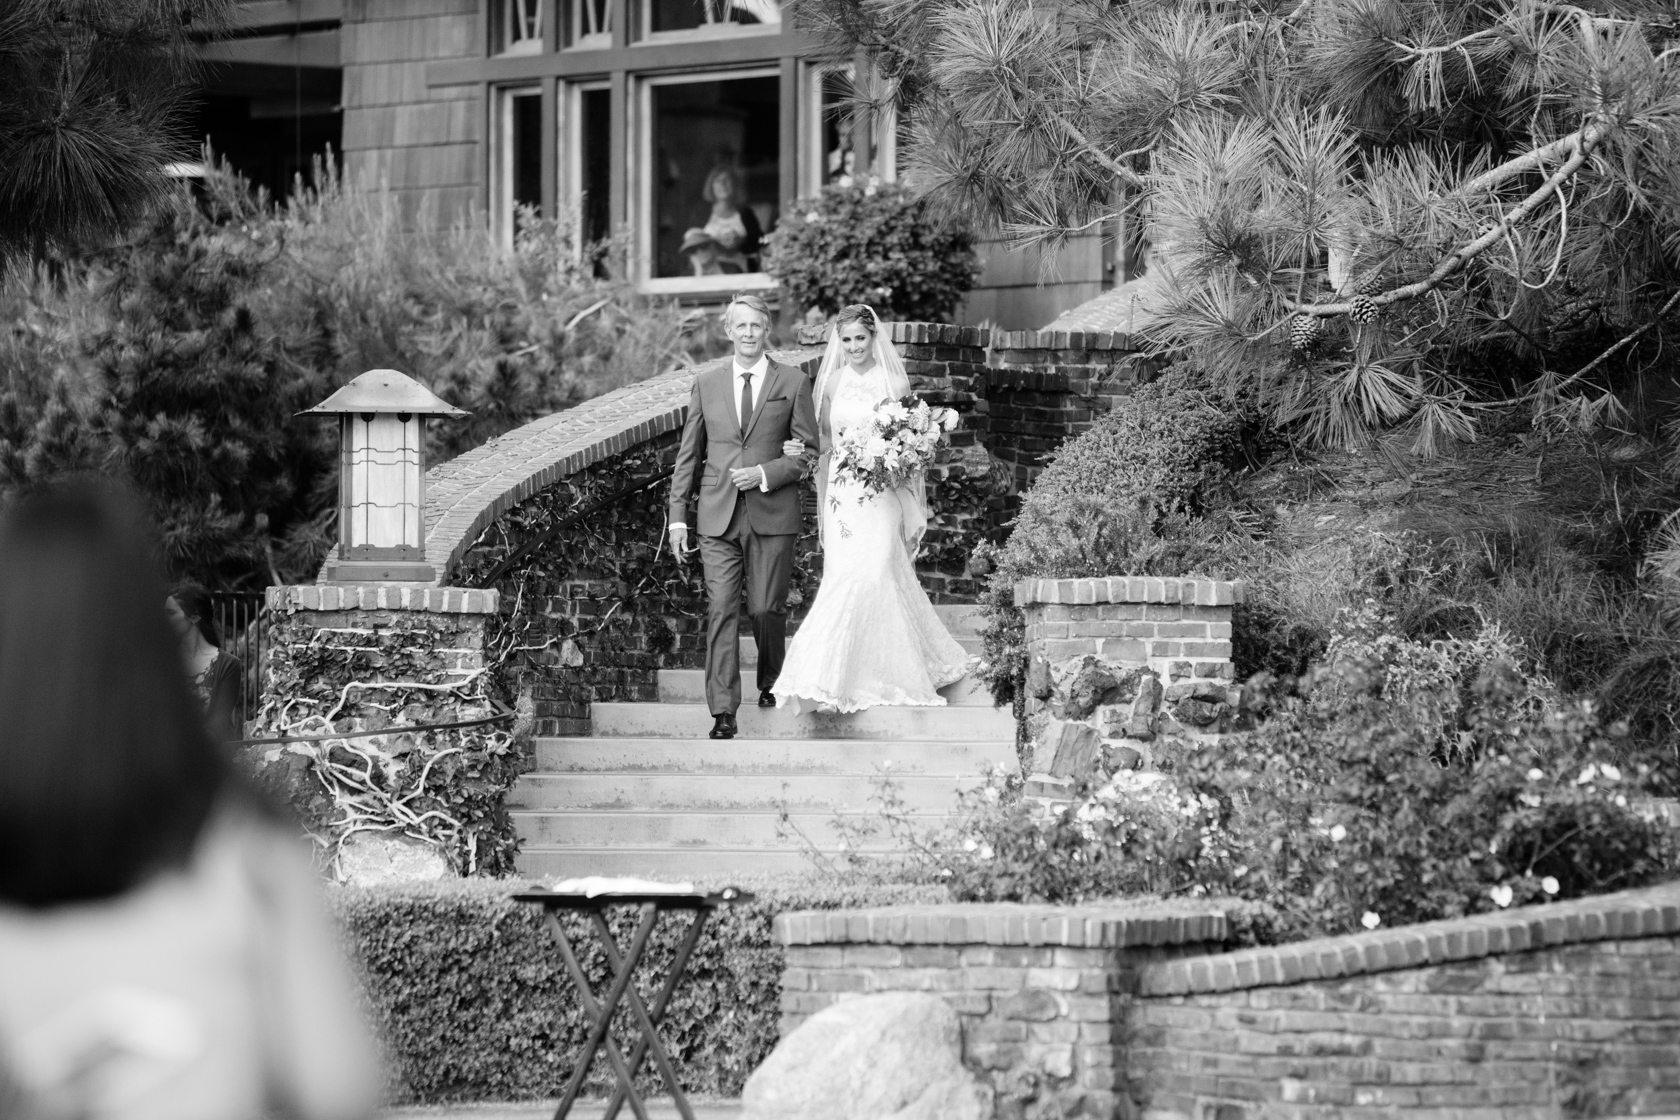 The_Lodge_at_Torrey_Pines_Wedding_039.jpg